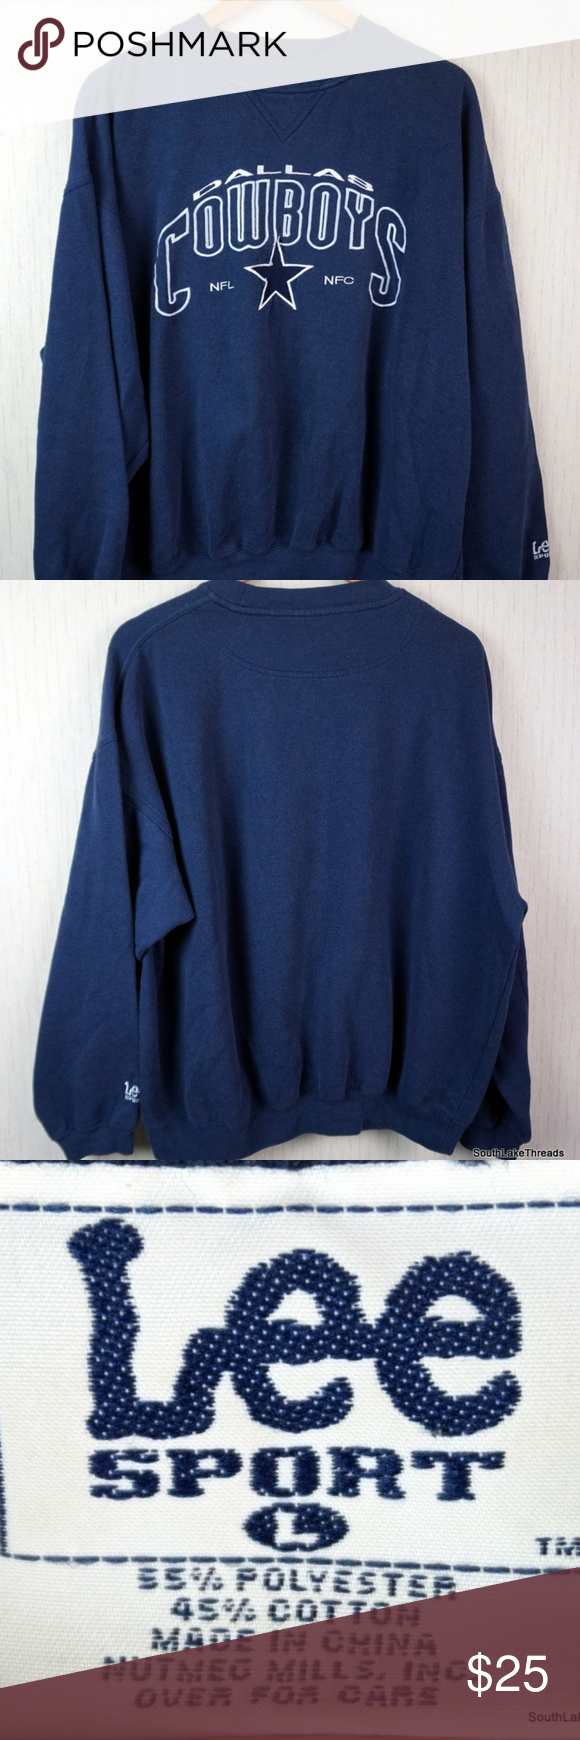 VTG 90s Dallas Cowboys Embroidered NFL Sweatshirt